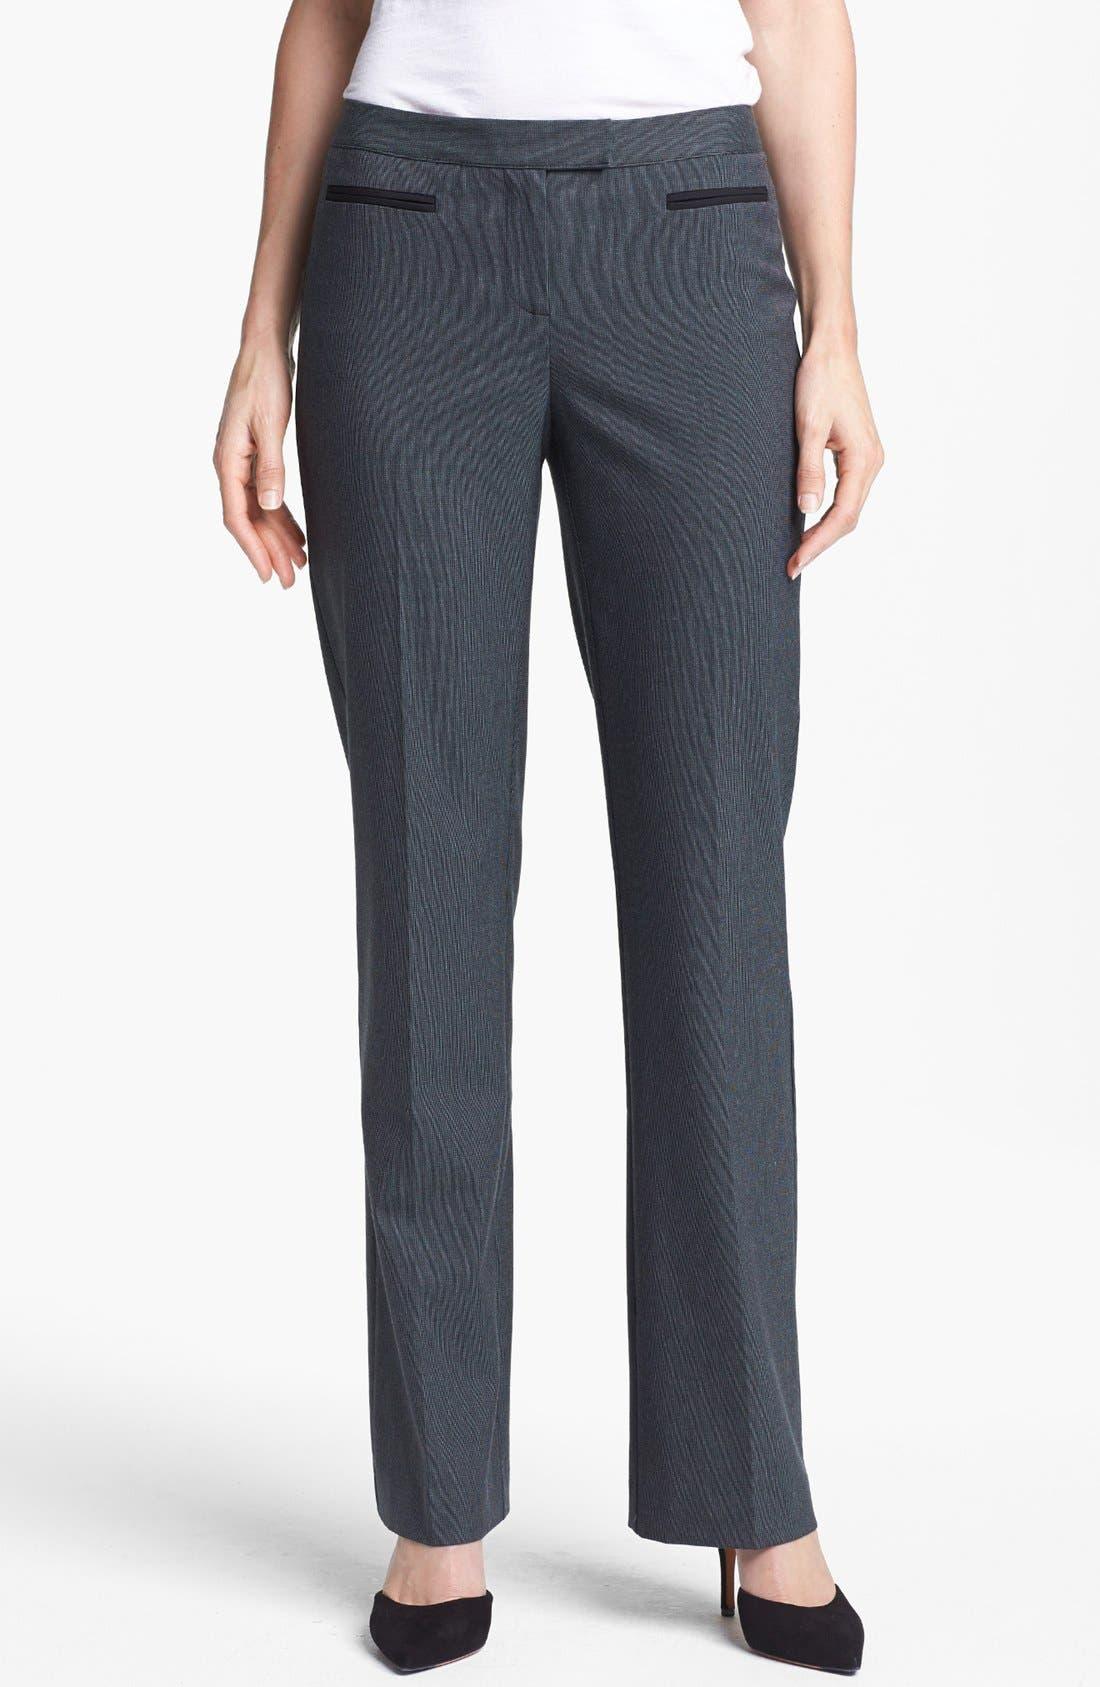 Main Image - Halogen® 'Taylor - Fox Hunt' Curvy Fit Pants (Regular & Petite)